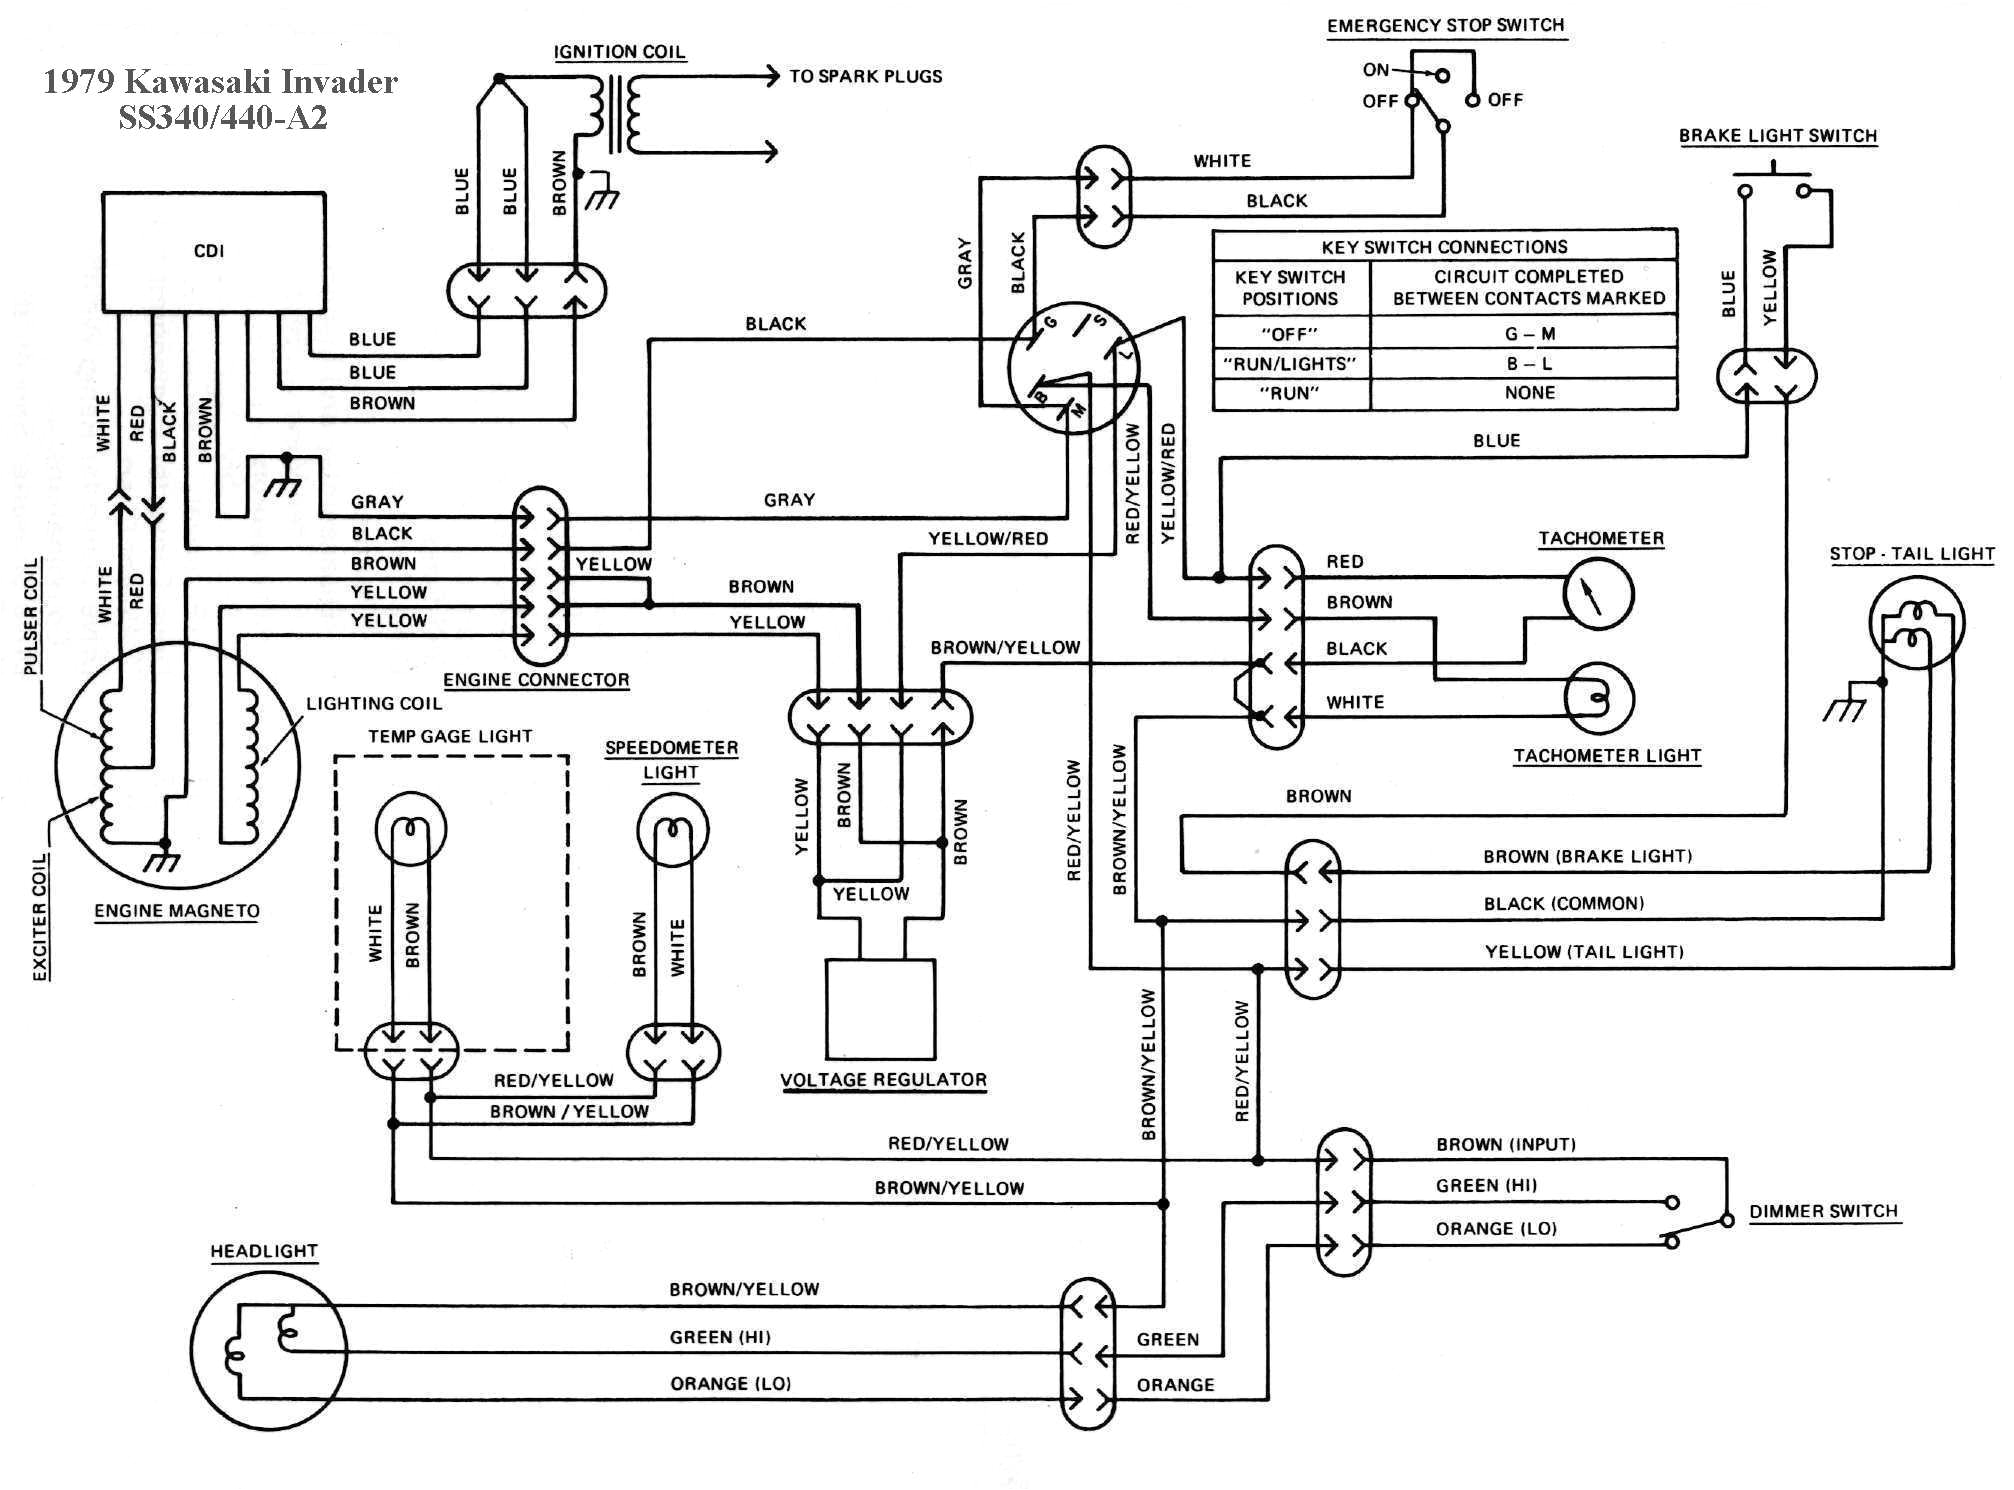 Kawasaki Mule 4010    Wiring       Diagram      autocardesign